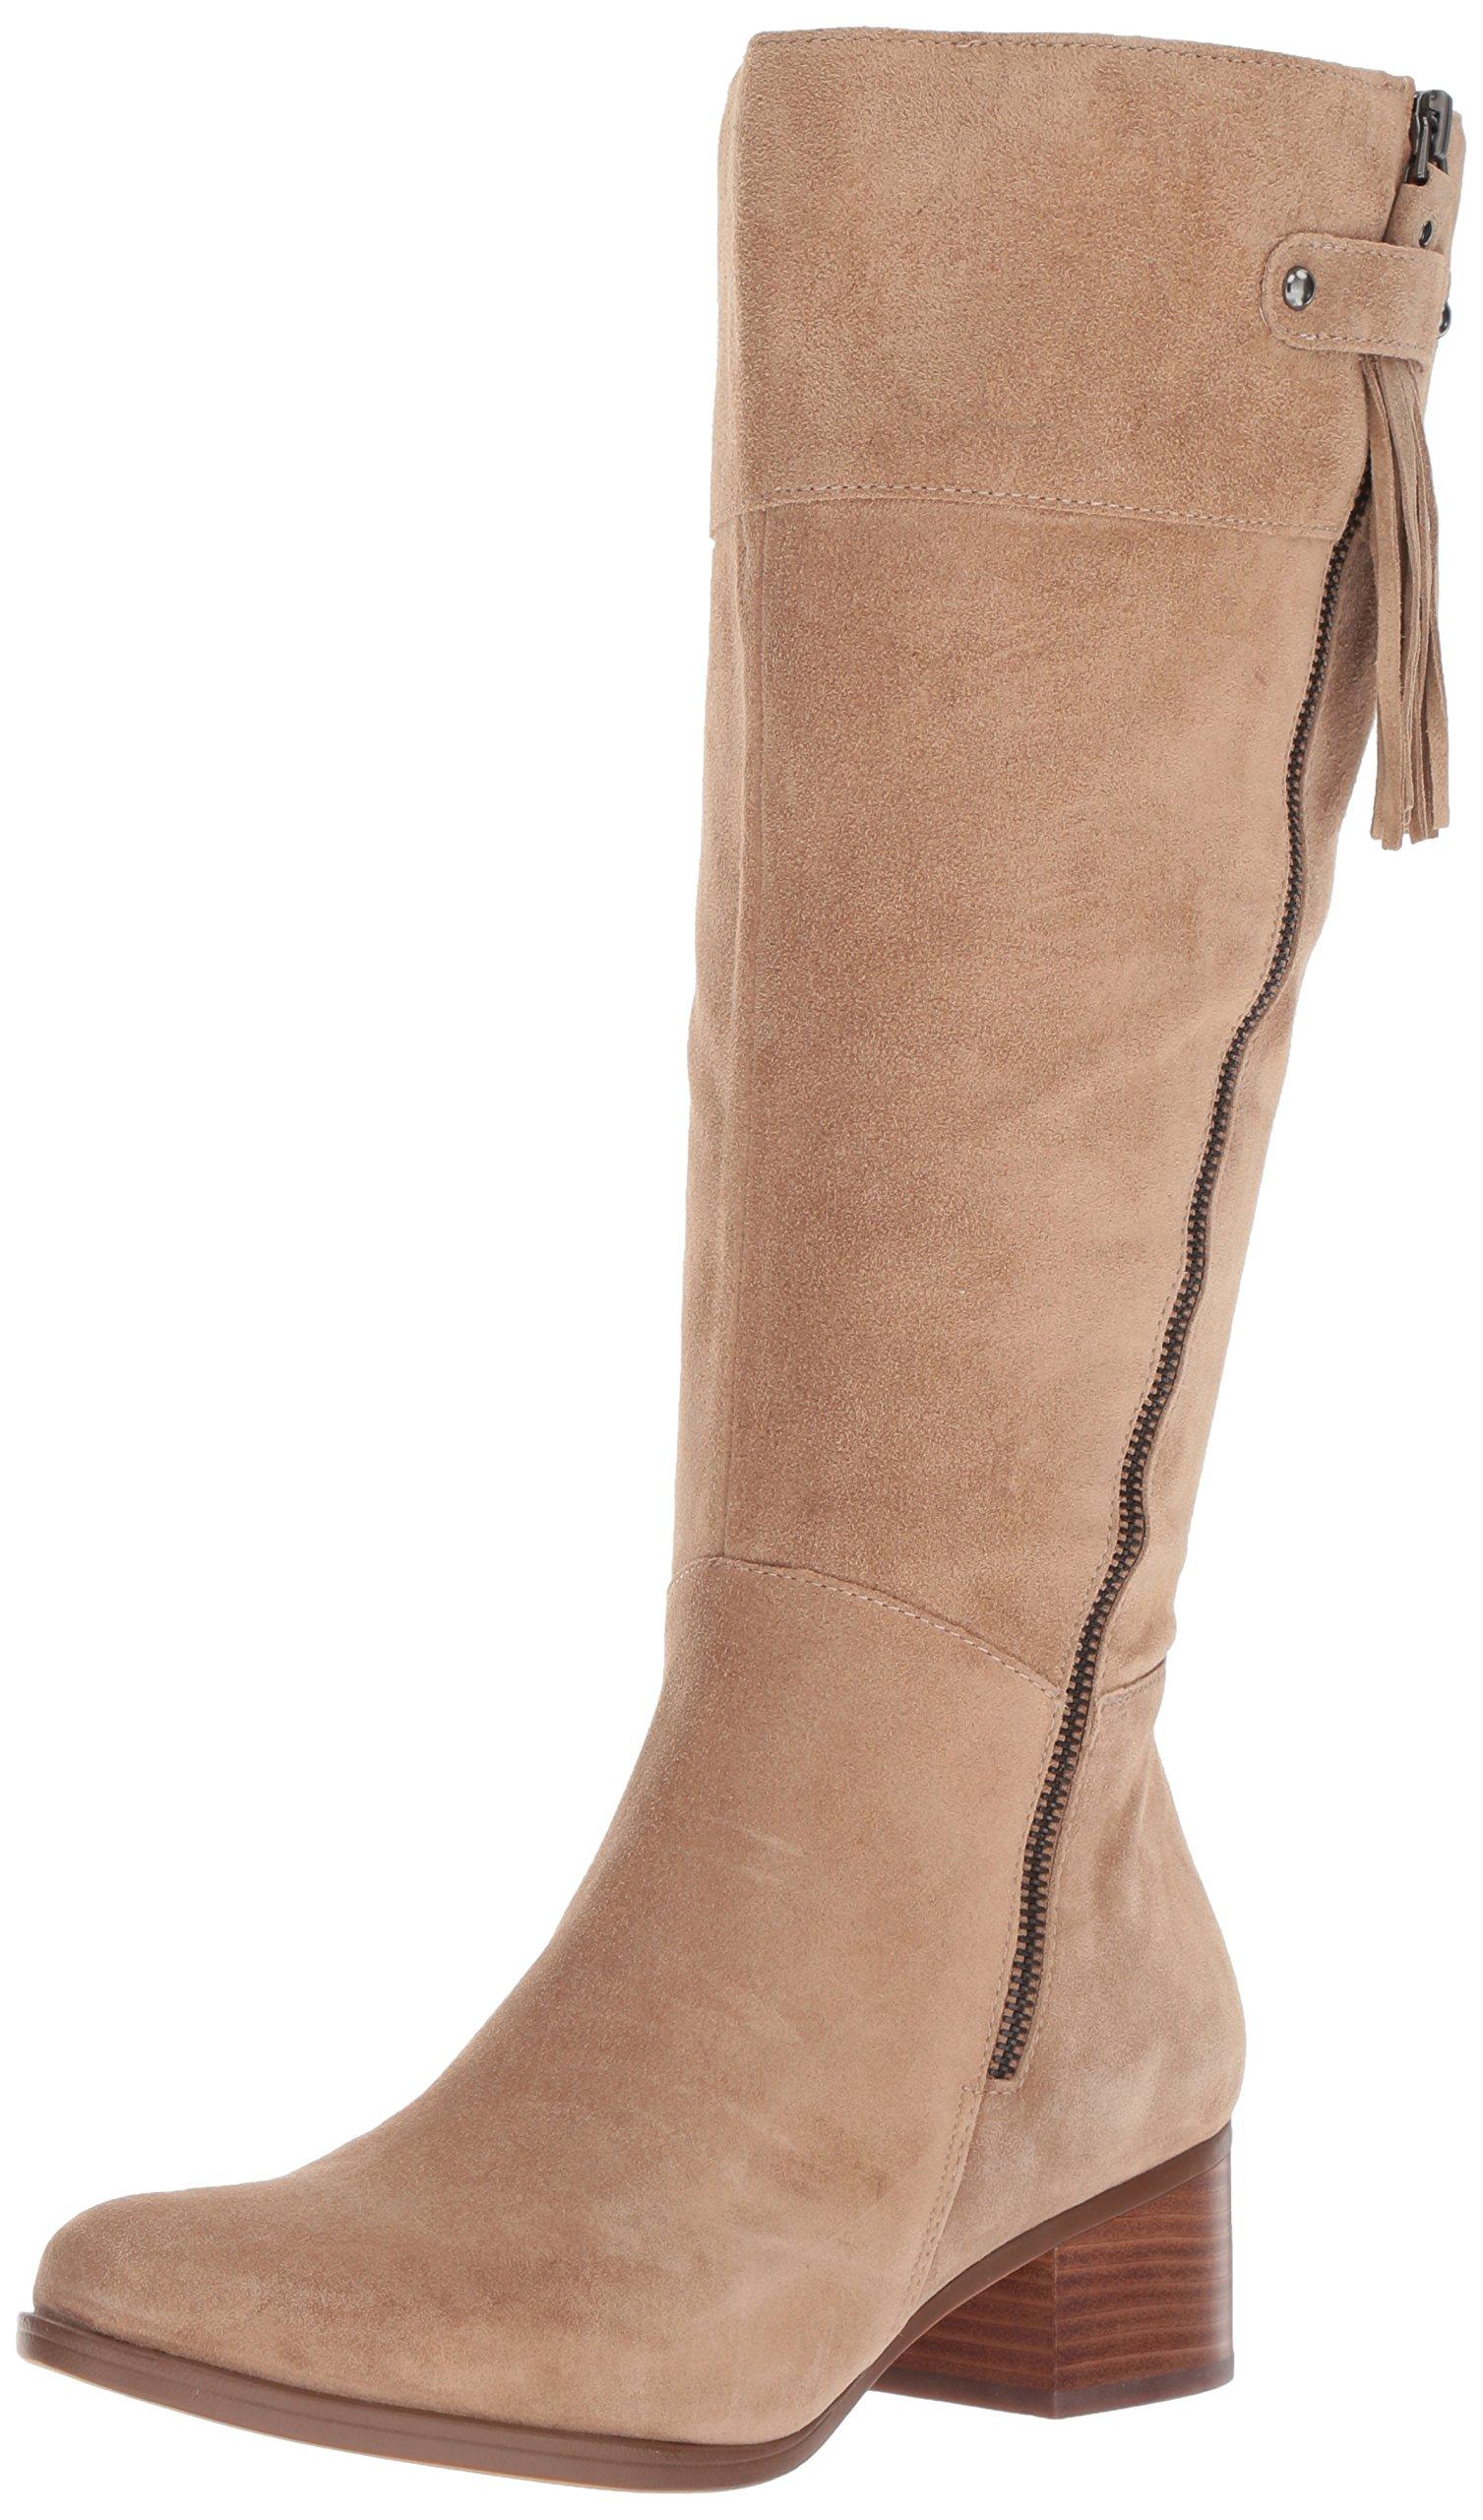 Naturalizer Women's Demi Wc Riding Boot, Oatmeal, 9 M US